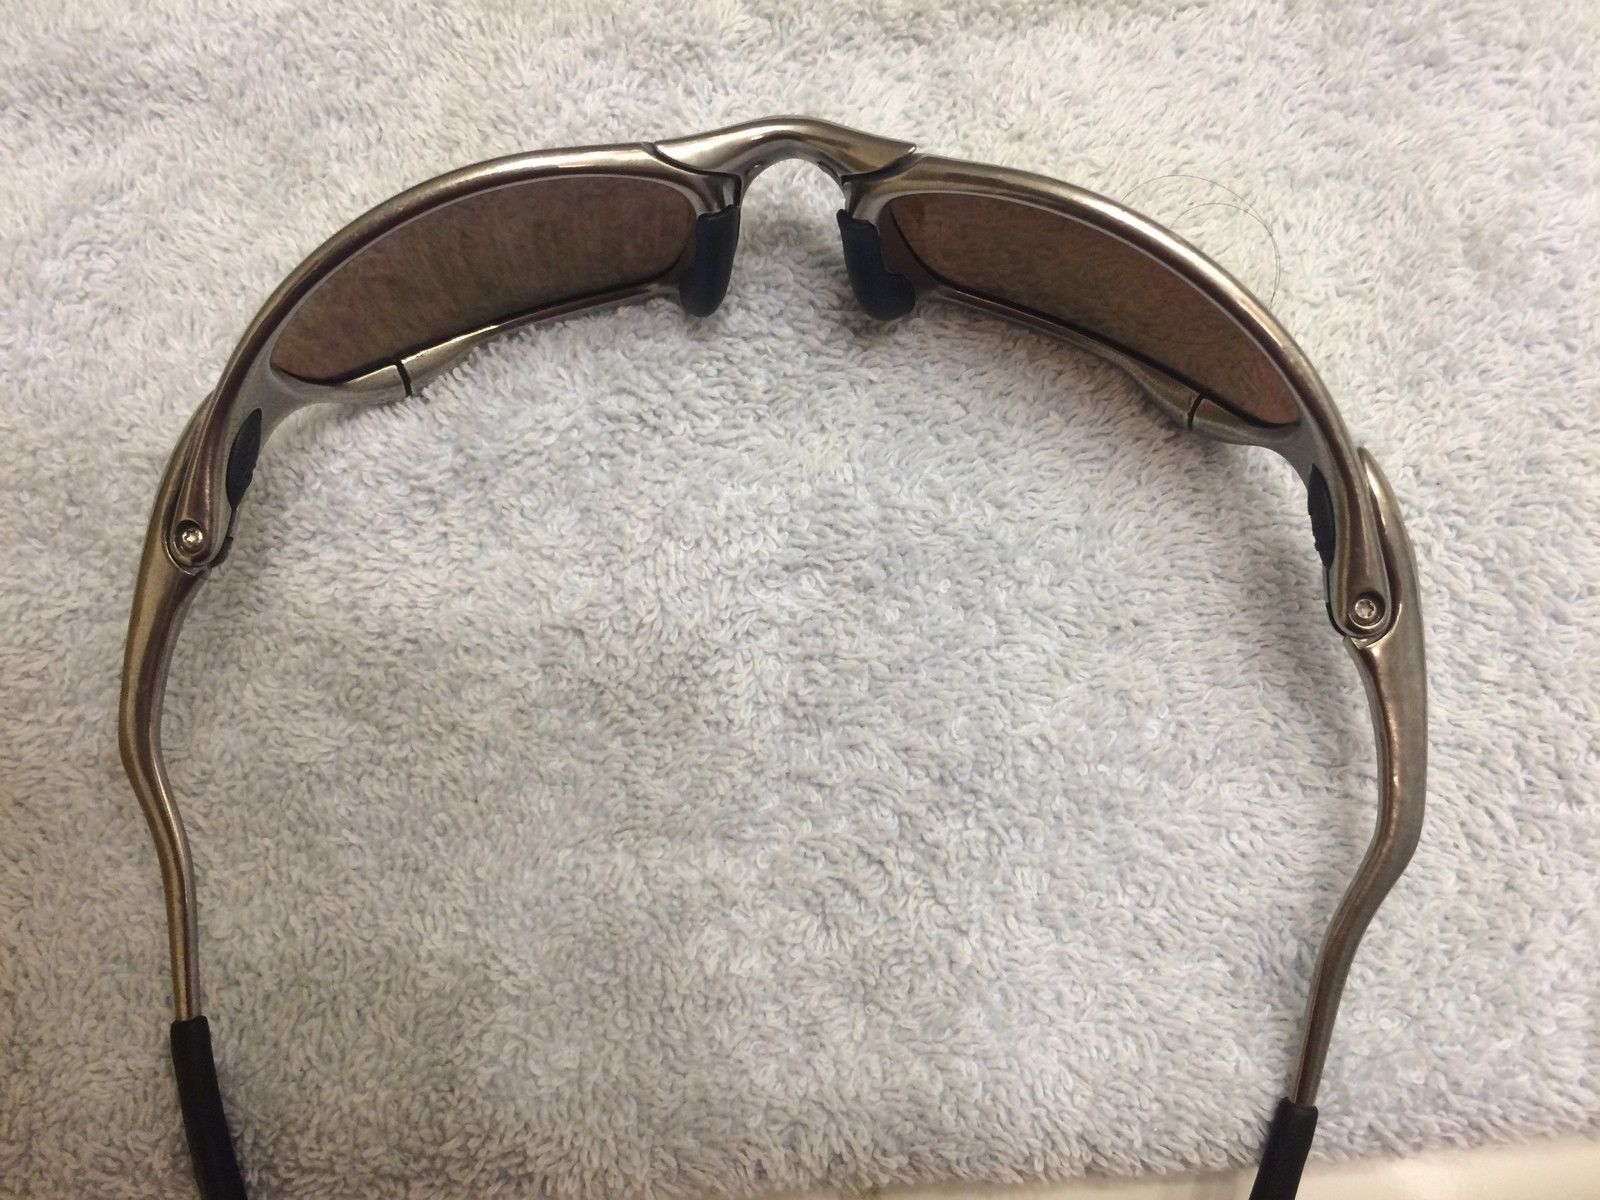 Juliet Polished w/Fire Iridium Lenses - Serial # - $265 - 2015-09-09 21.36.37.jpg